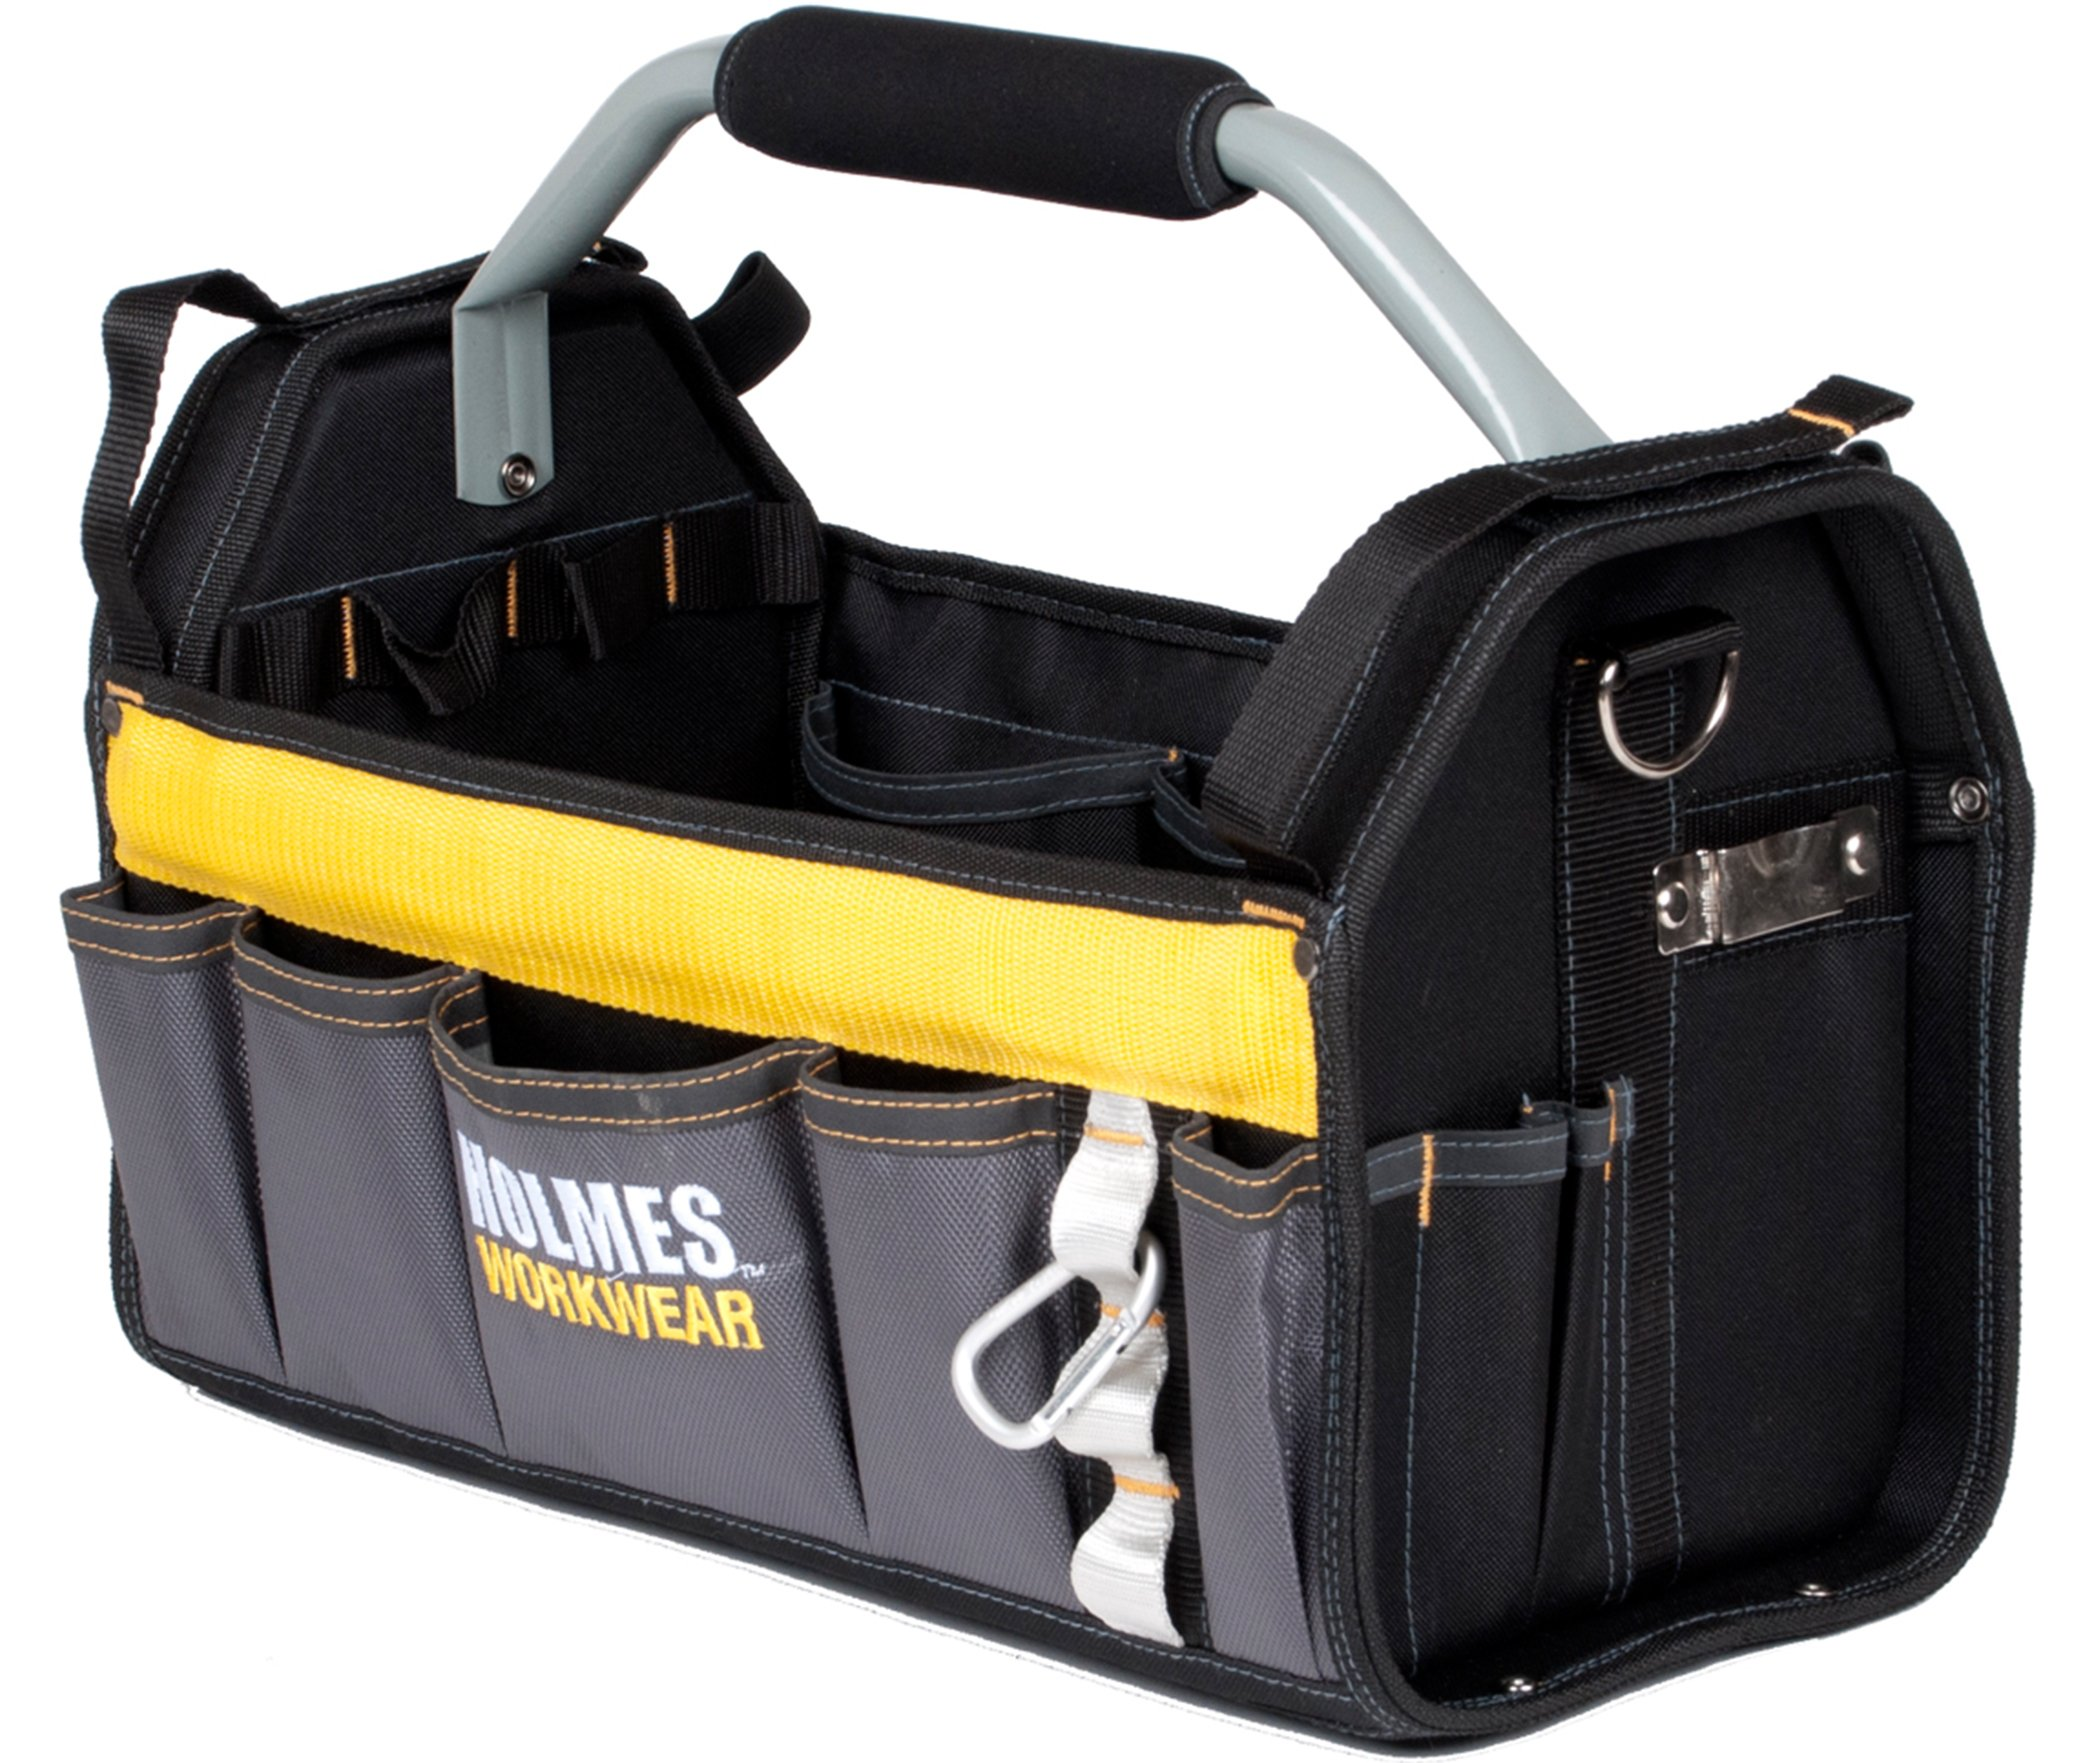 Holmes Workwear 60-9004-MH 16-inch Heavy Duty Tool Bag by Holmes (Image #5)